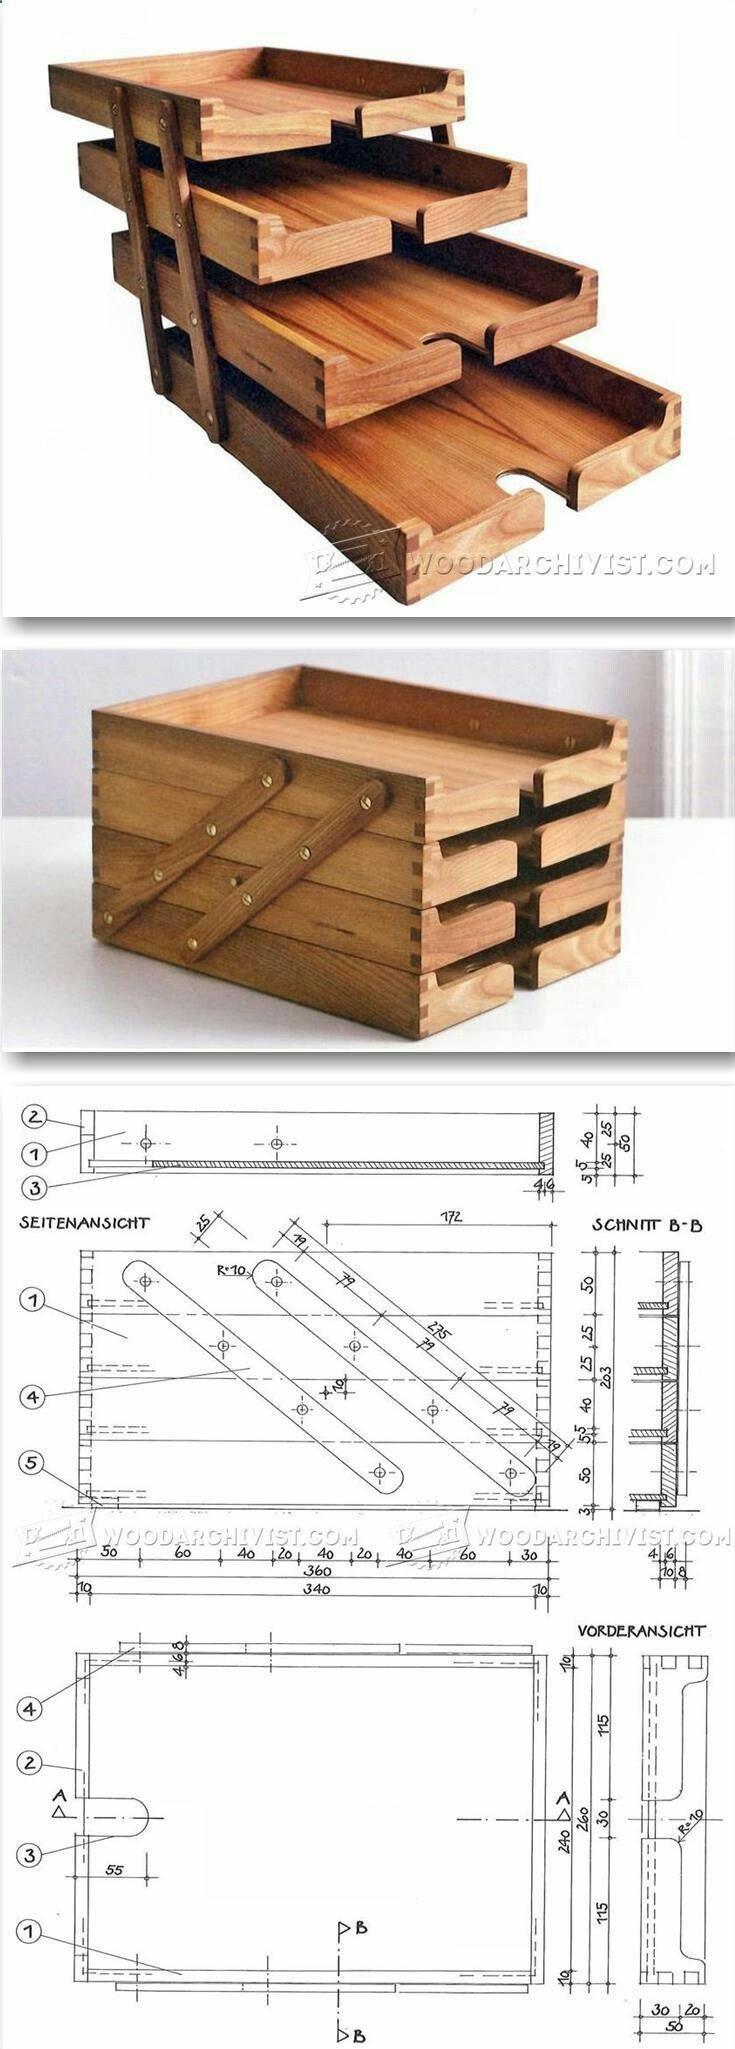 17+ Tantalizing Woodworking Tricks Ideas Atemberaubende Tricks: Holzbearbeitung …